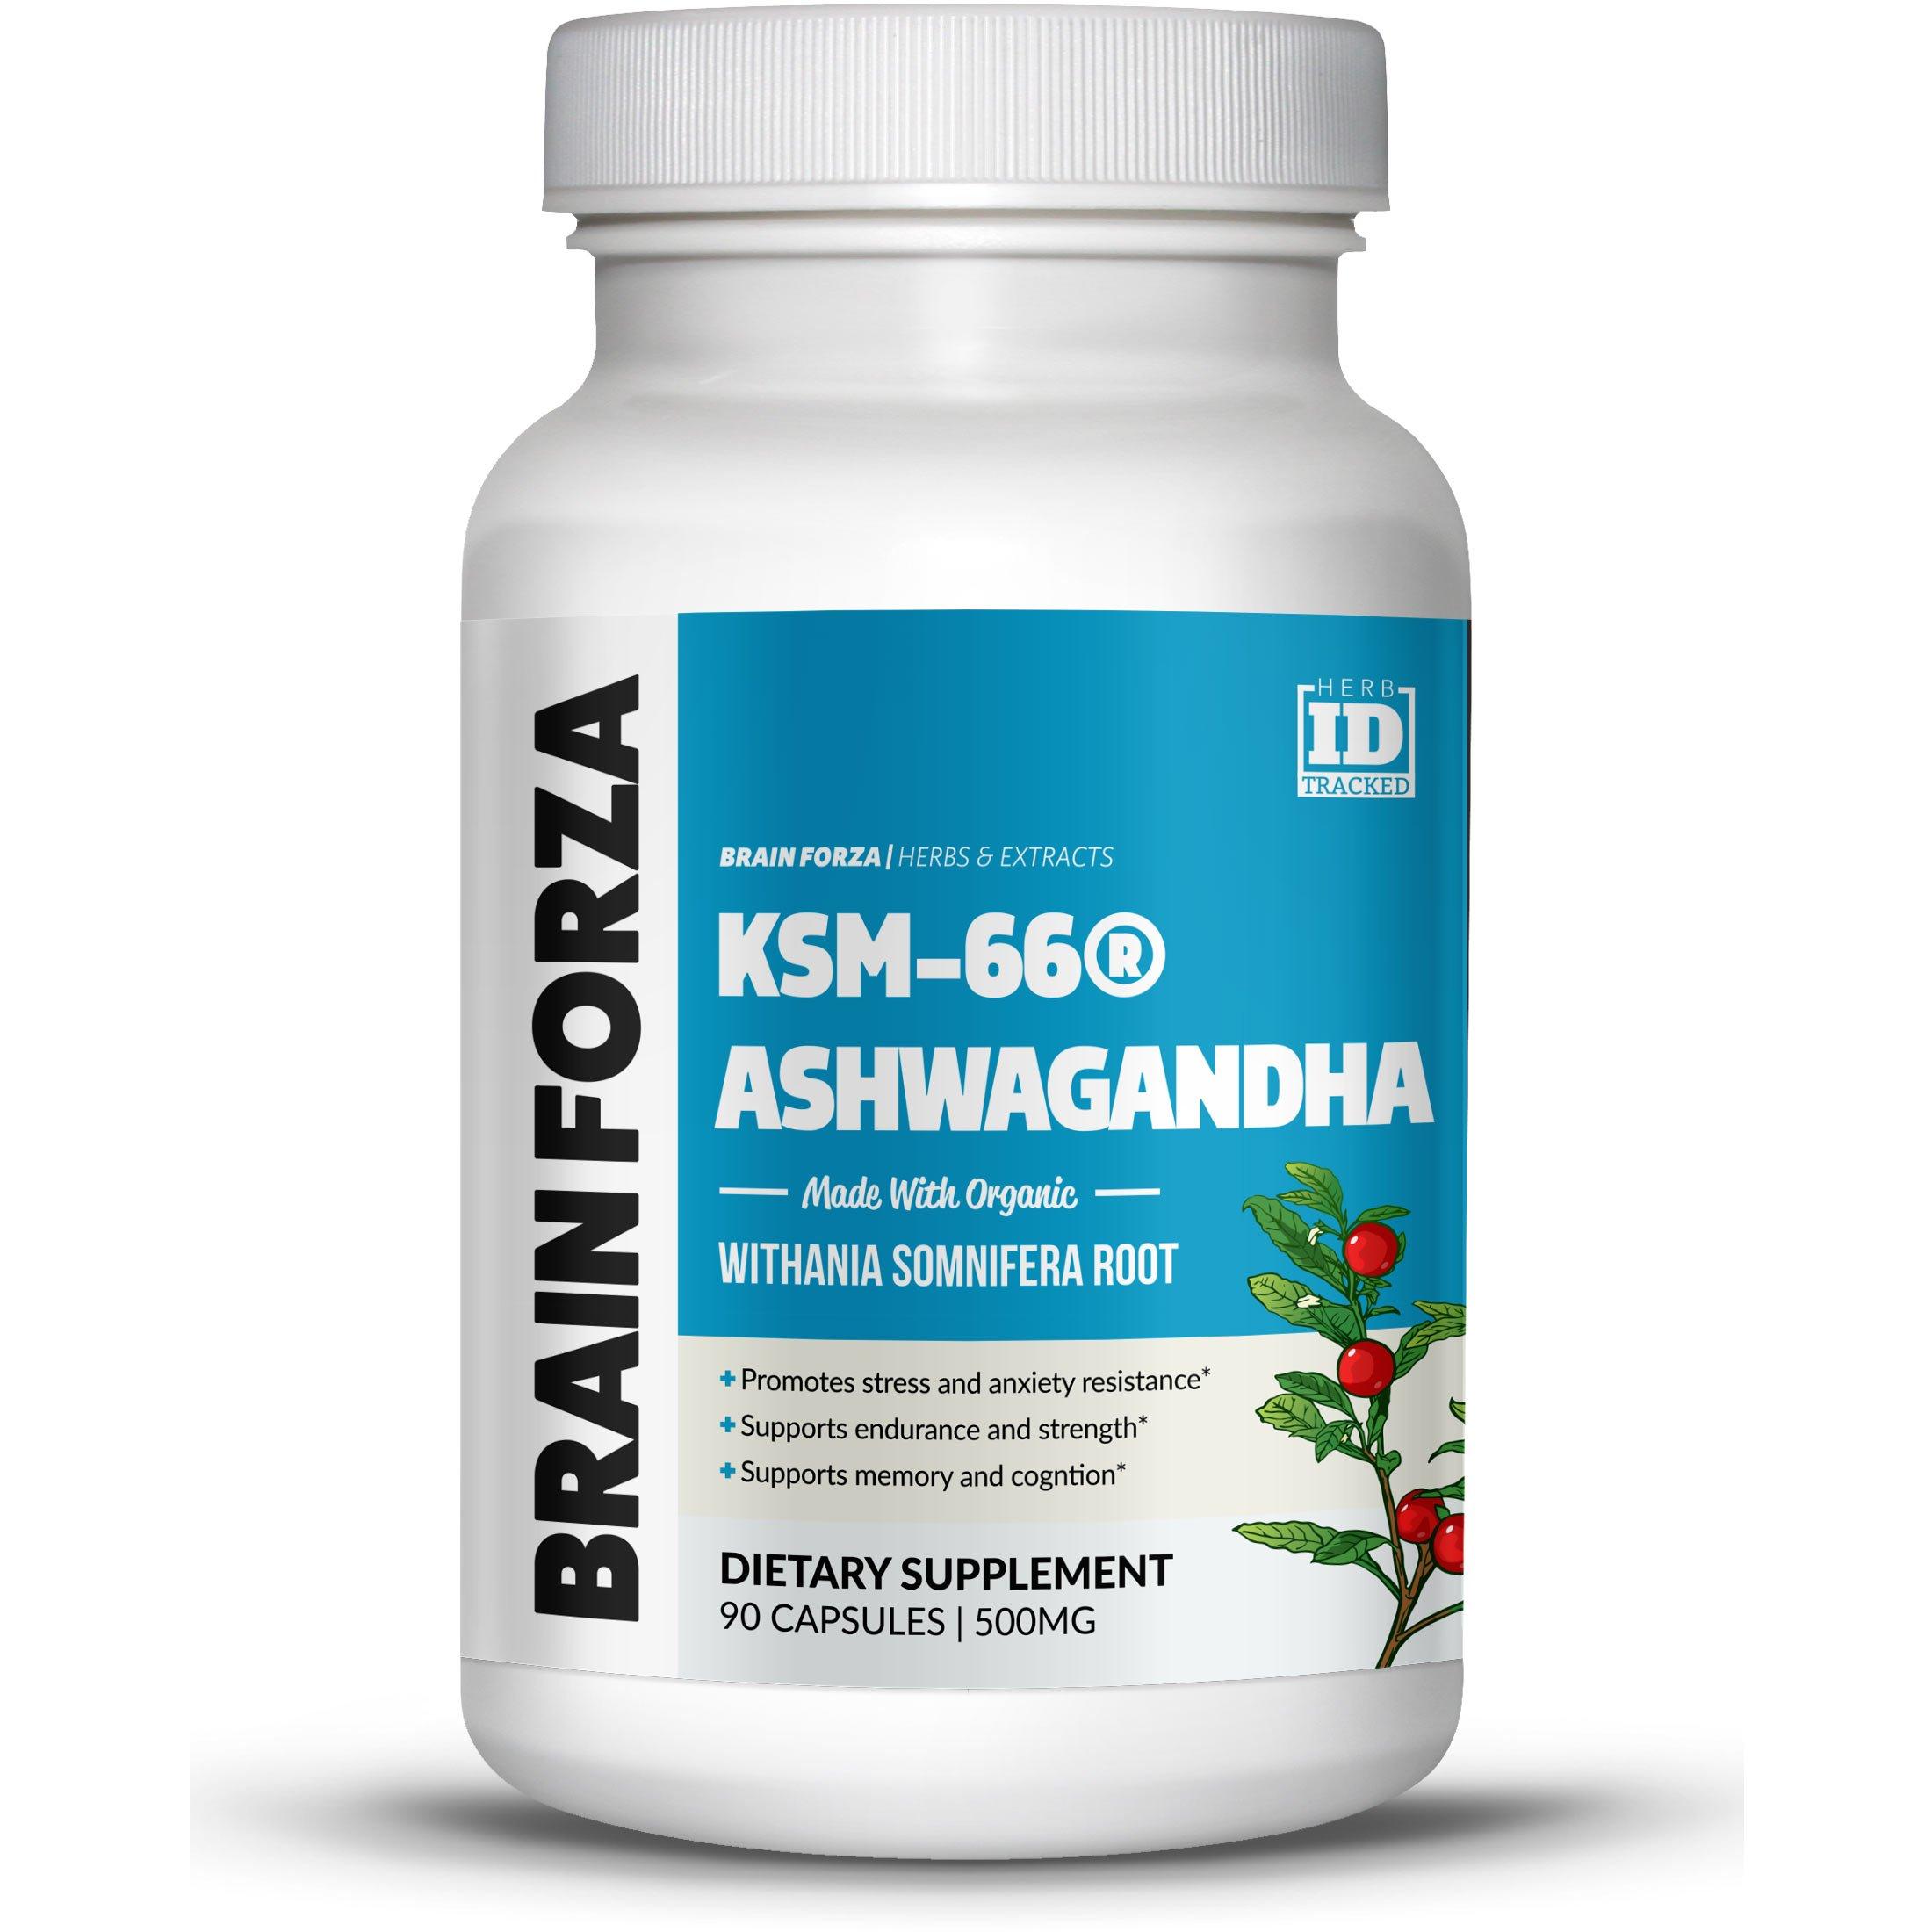 Brain Forza Organic KSM-66 Ashwagandha Root Extract 1,000mg/day for Brain, Stress, Memory and Sleep Support, Organic, Non-GMO, 90 Capsules